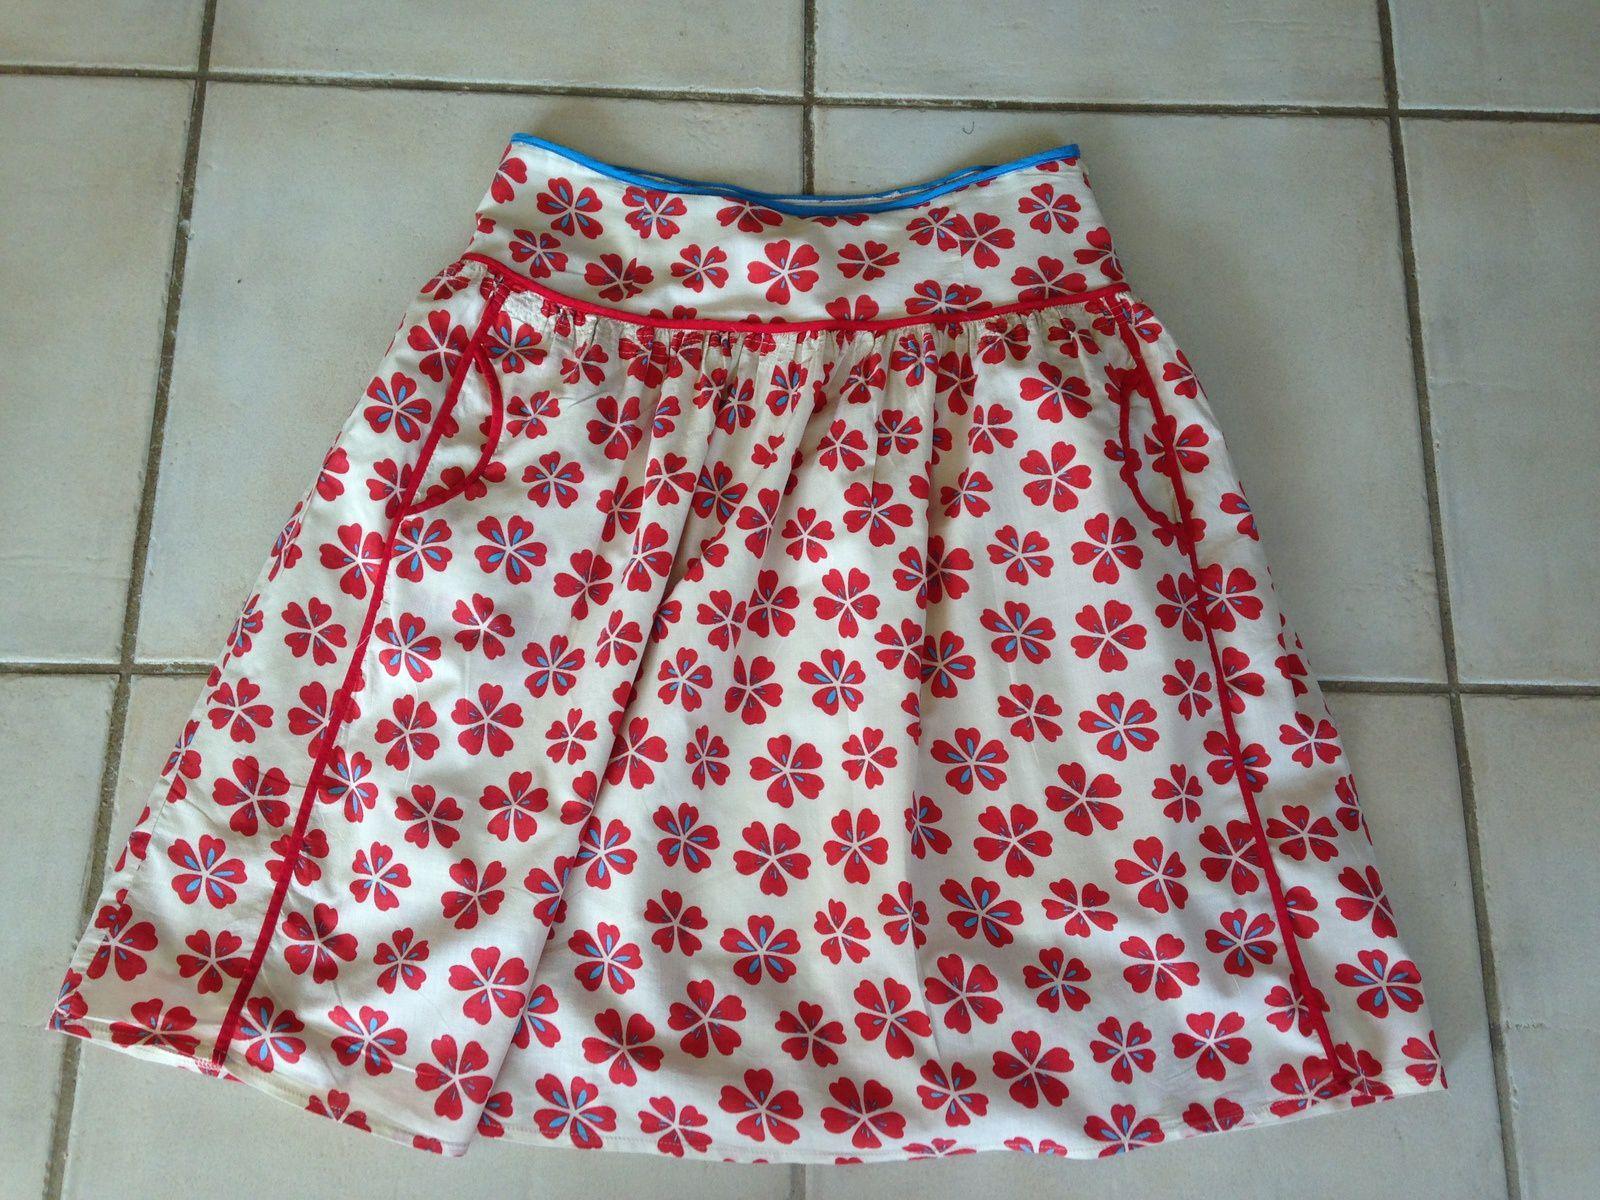 tramsformer une robe en jupe sur charlotteblabla blog*